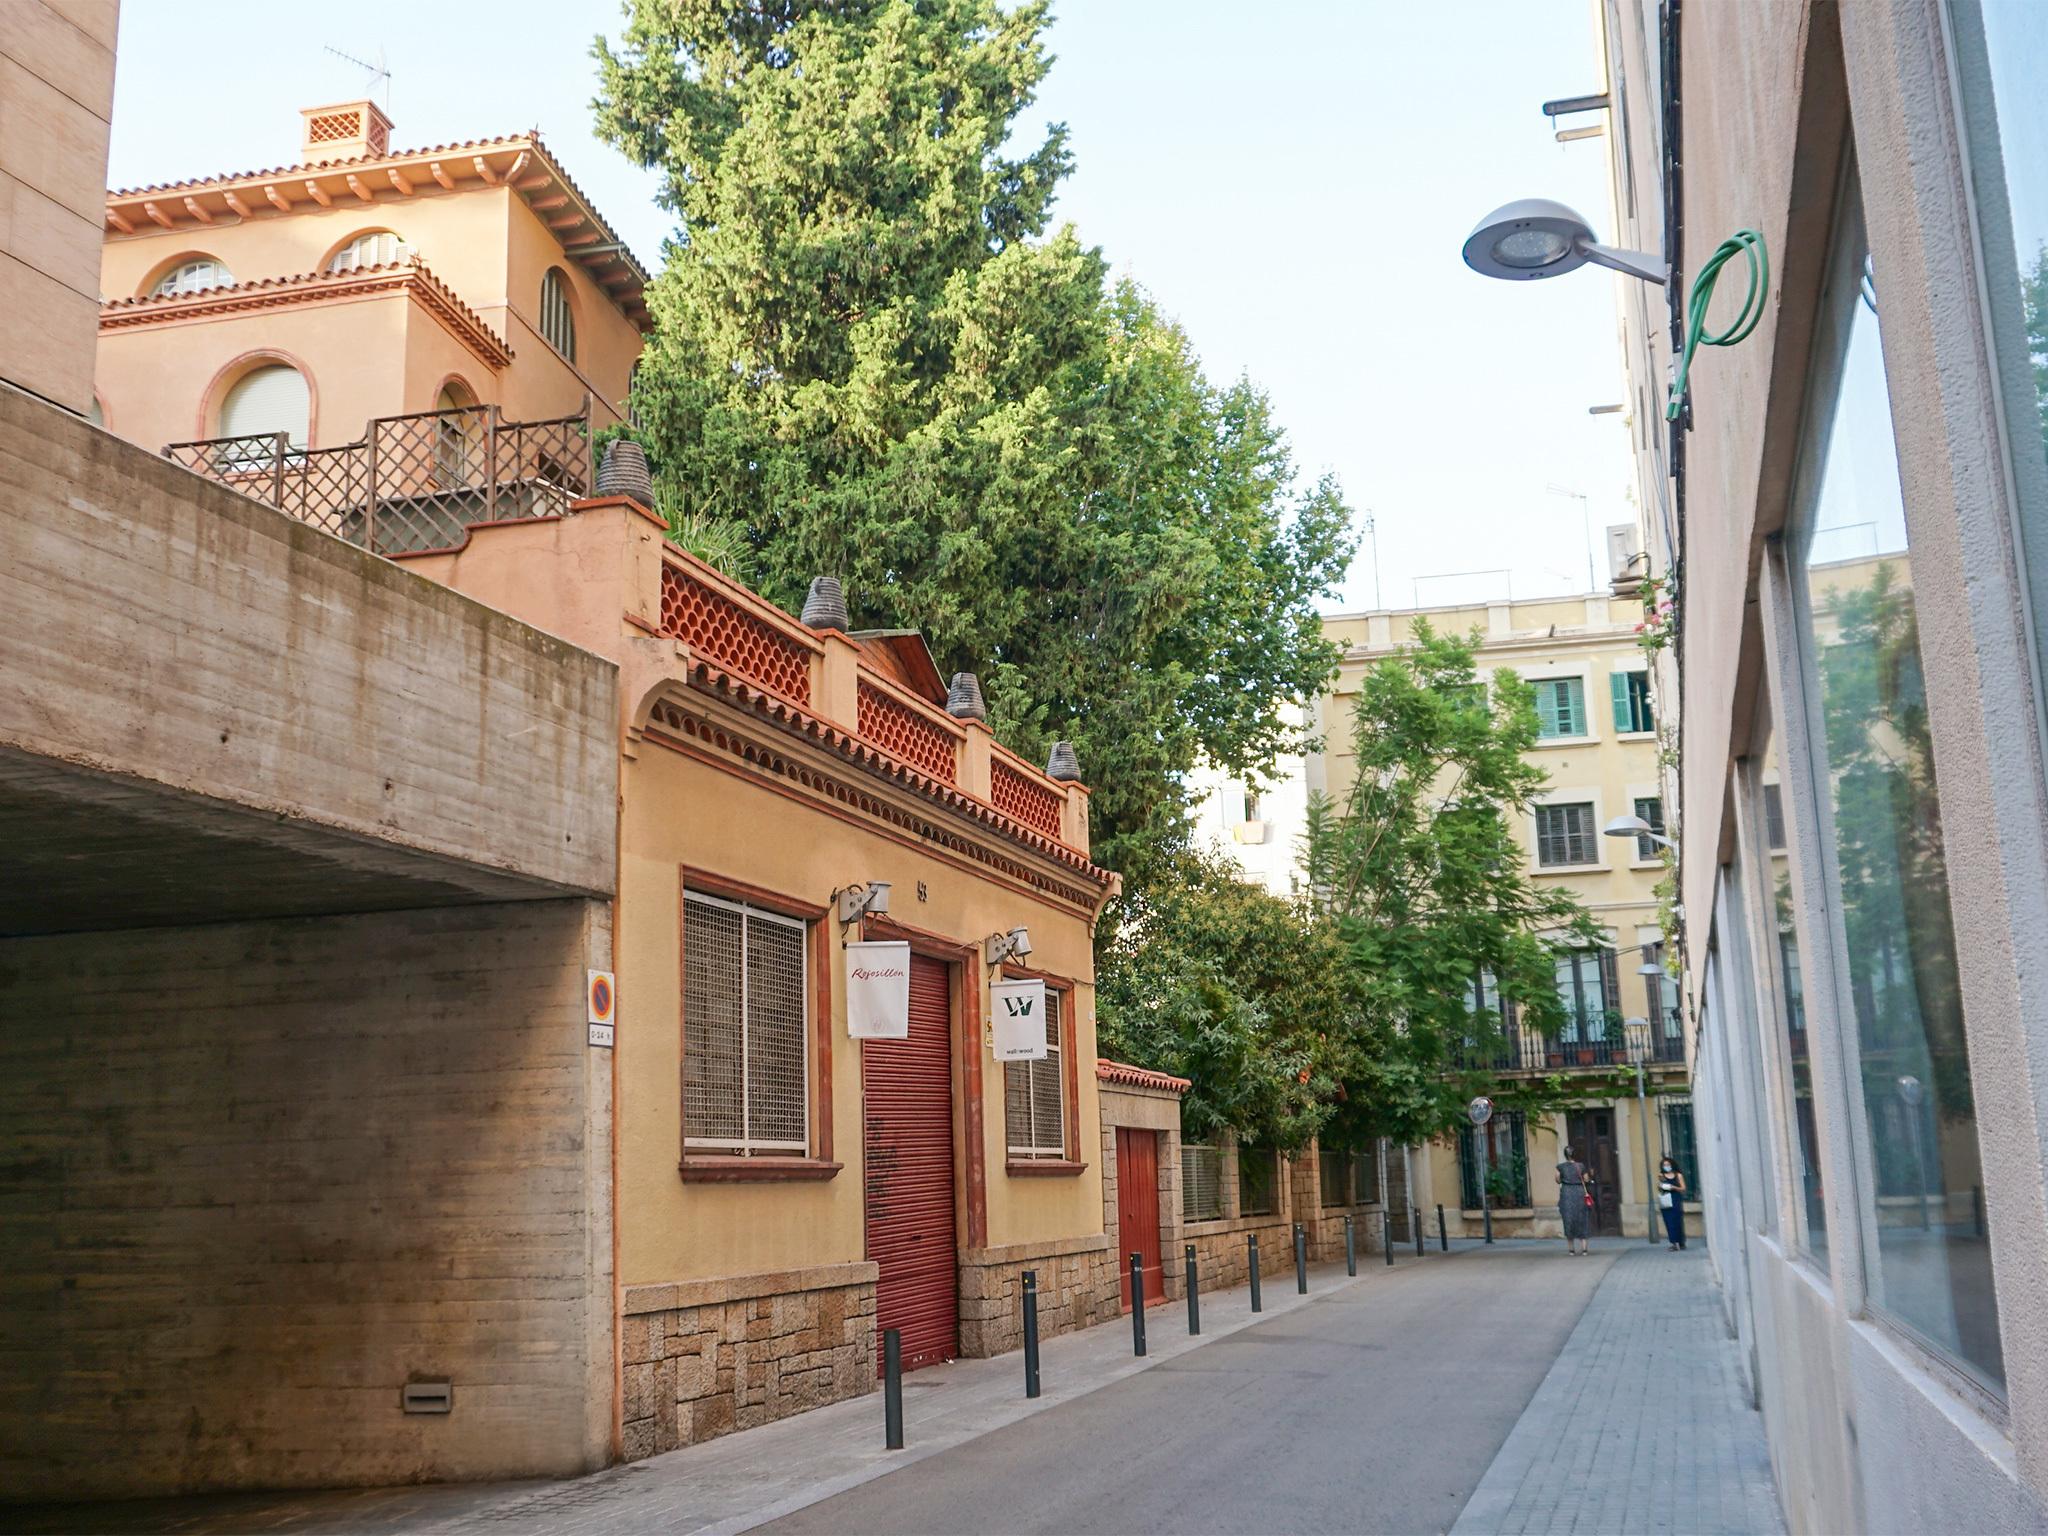 Betlem, Barcelona streets